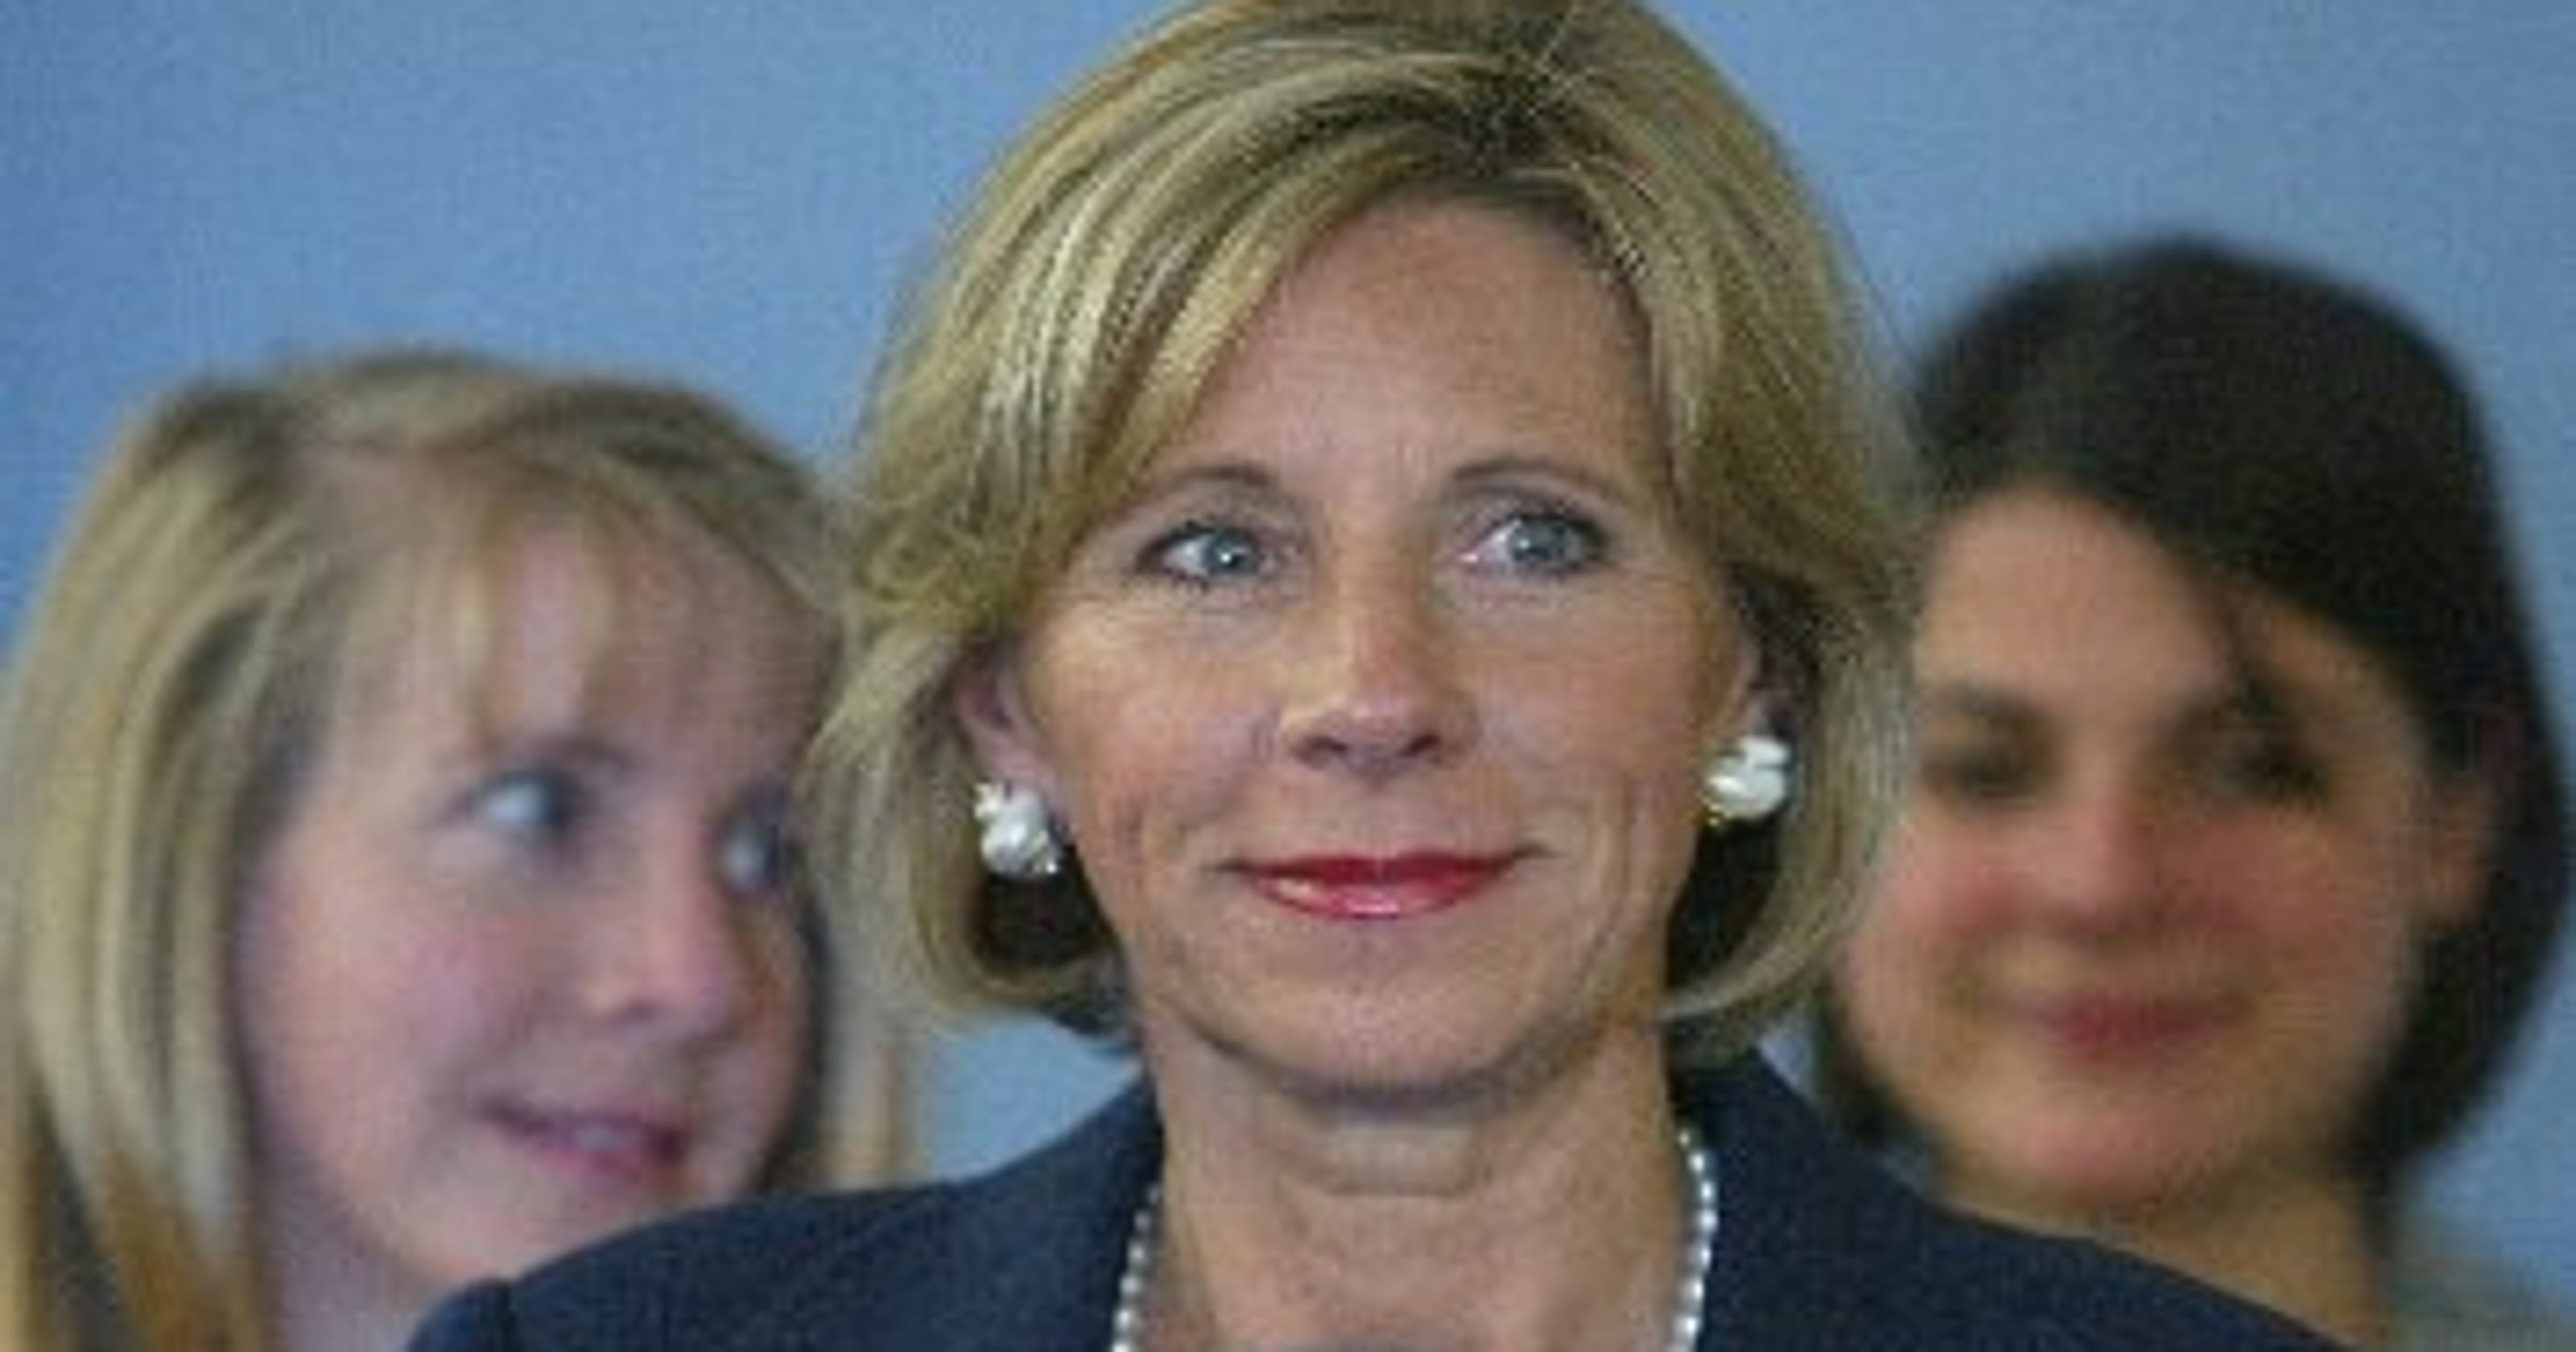 Betsy Devos And Plan To Break Public >> Betsy Devos Fighter For Kids Or Destroyer Of Public Schools